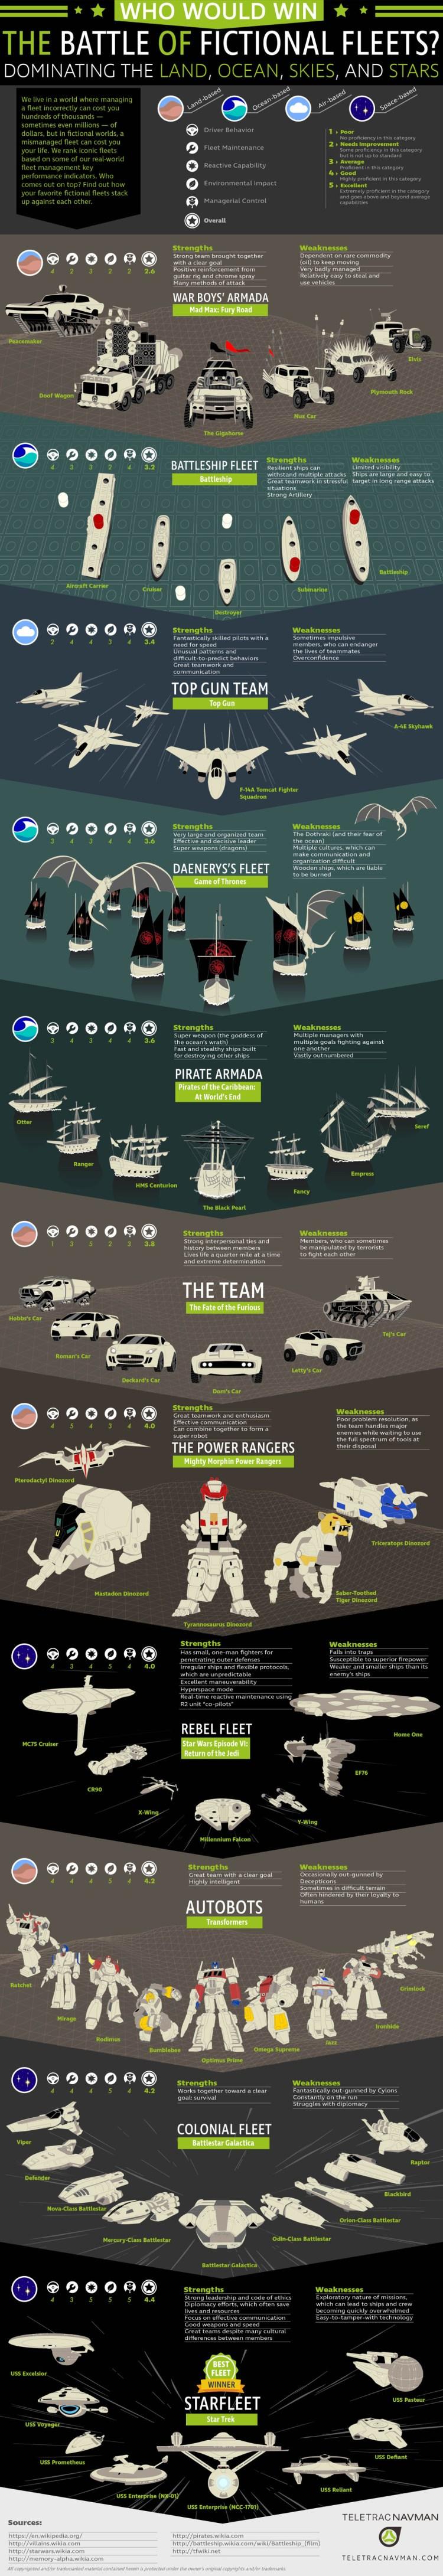 star-trek-starfleet-awarded-best-fictional-fleet